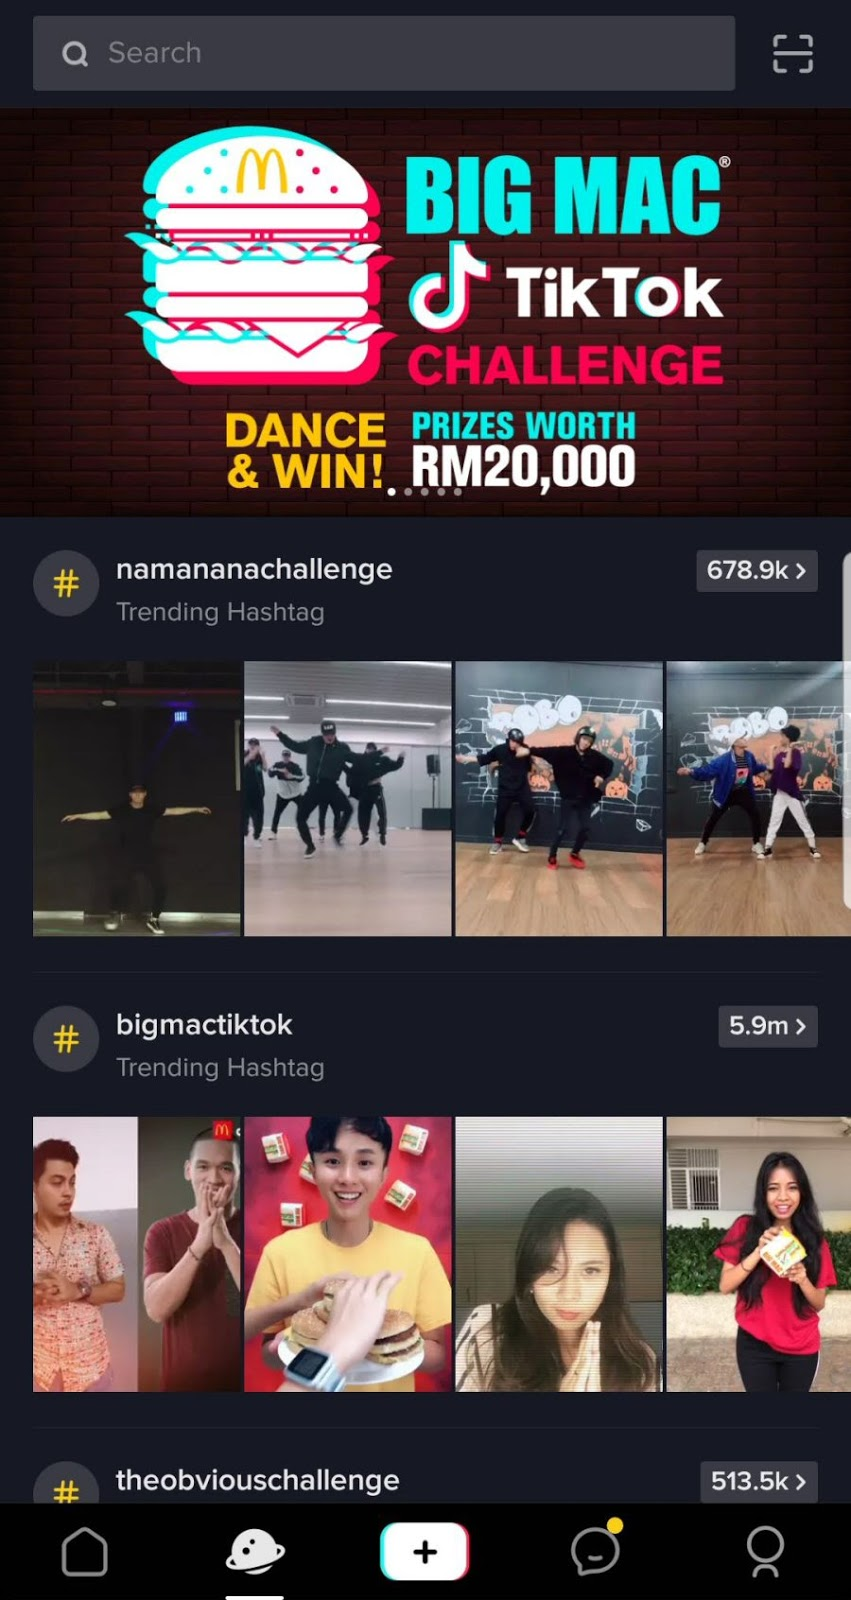 Big Mac x TikTok Challenge: Banner in TikTok app